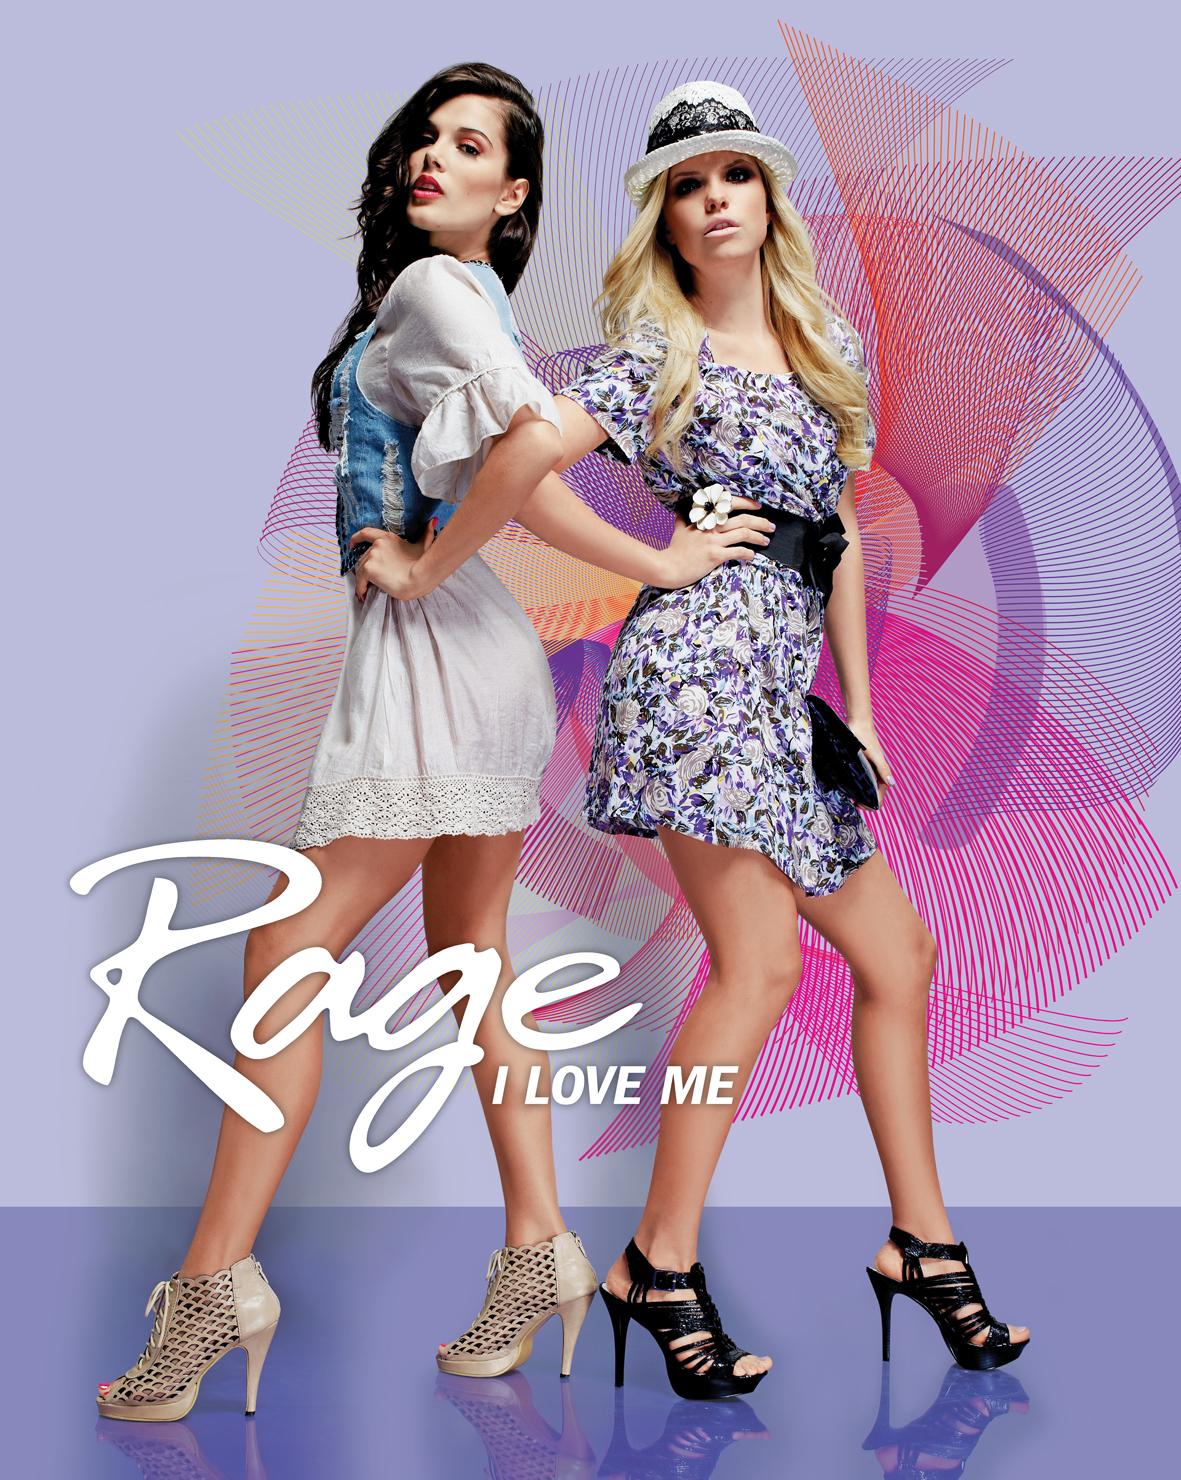 Rage summer 2010 Billboardsmall.jpg